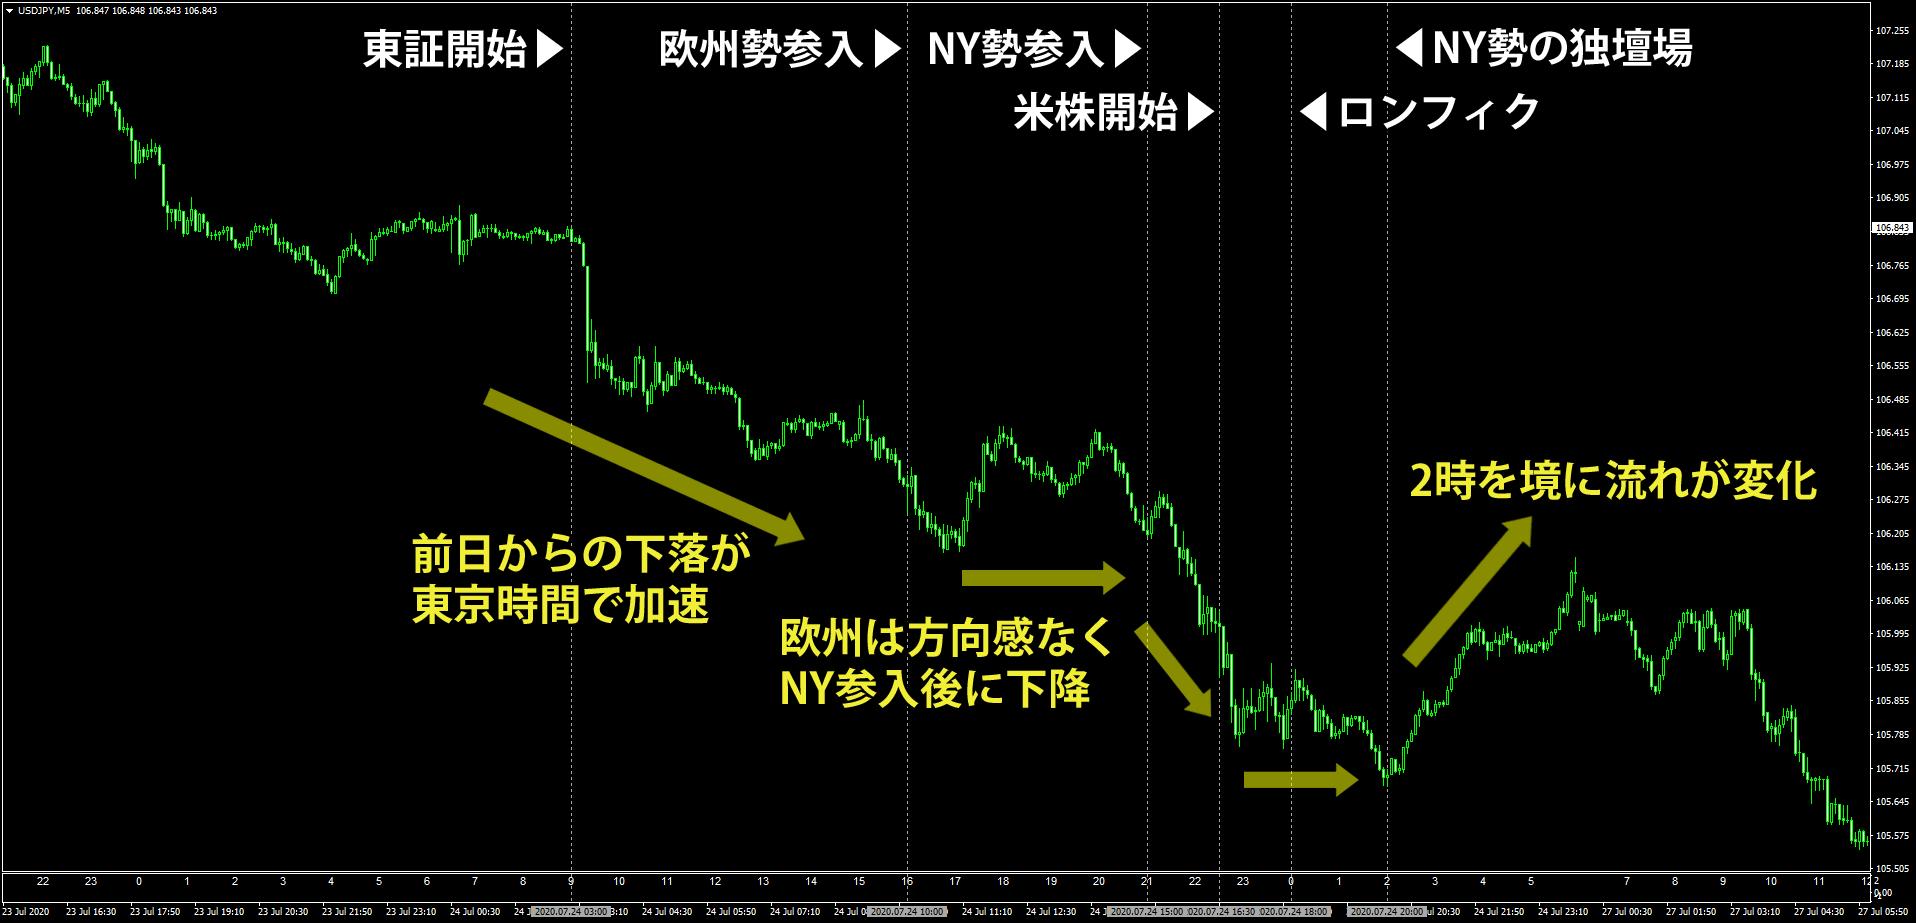 NY時間での特徴的なドル円の動き